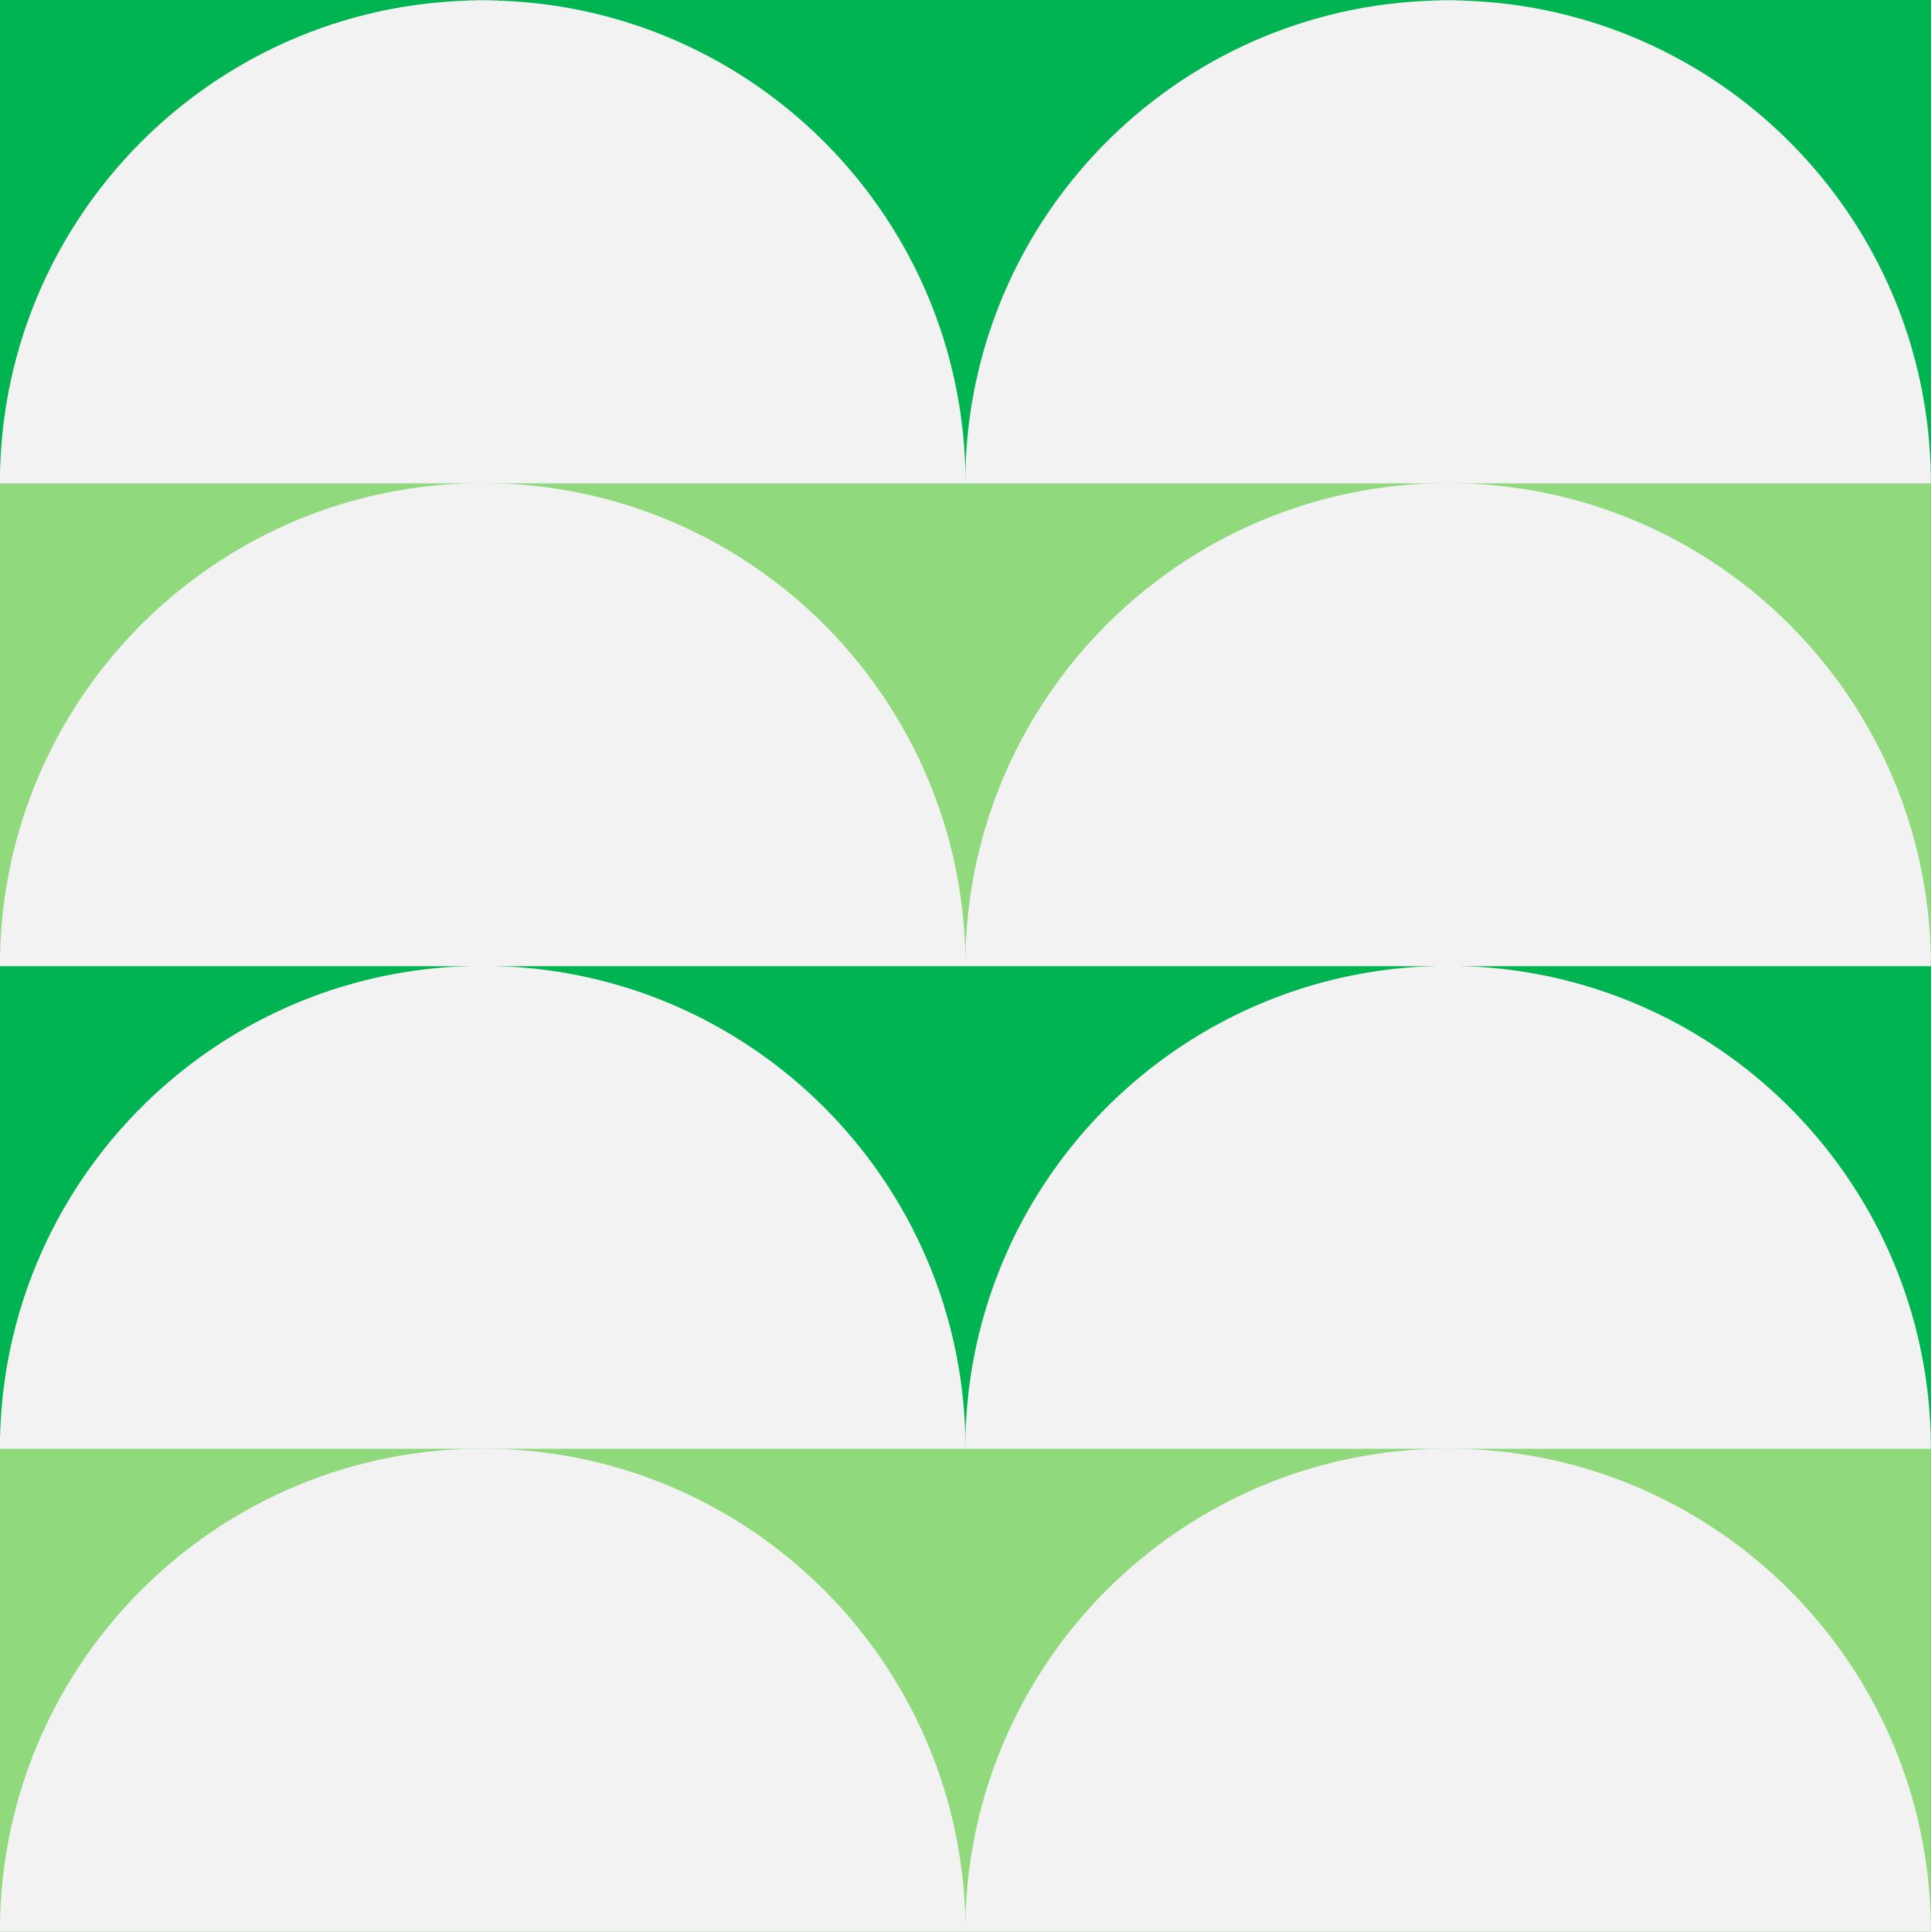 Derprosa™ Gloss Premier reLIFE 50